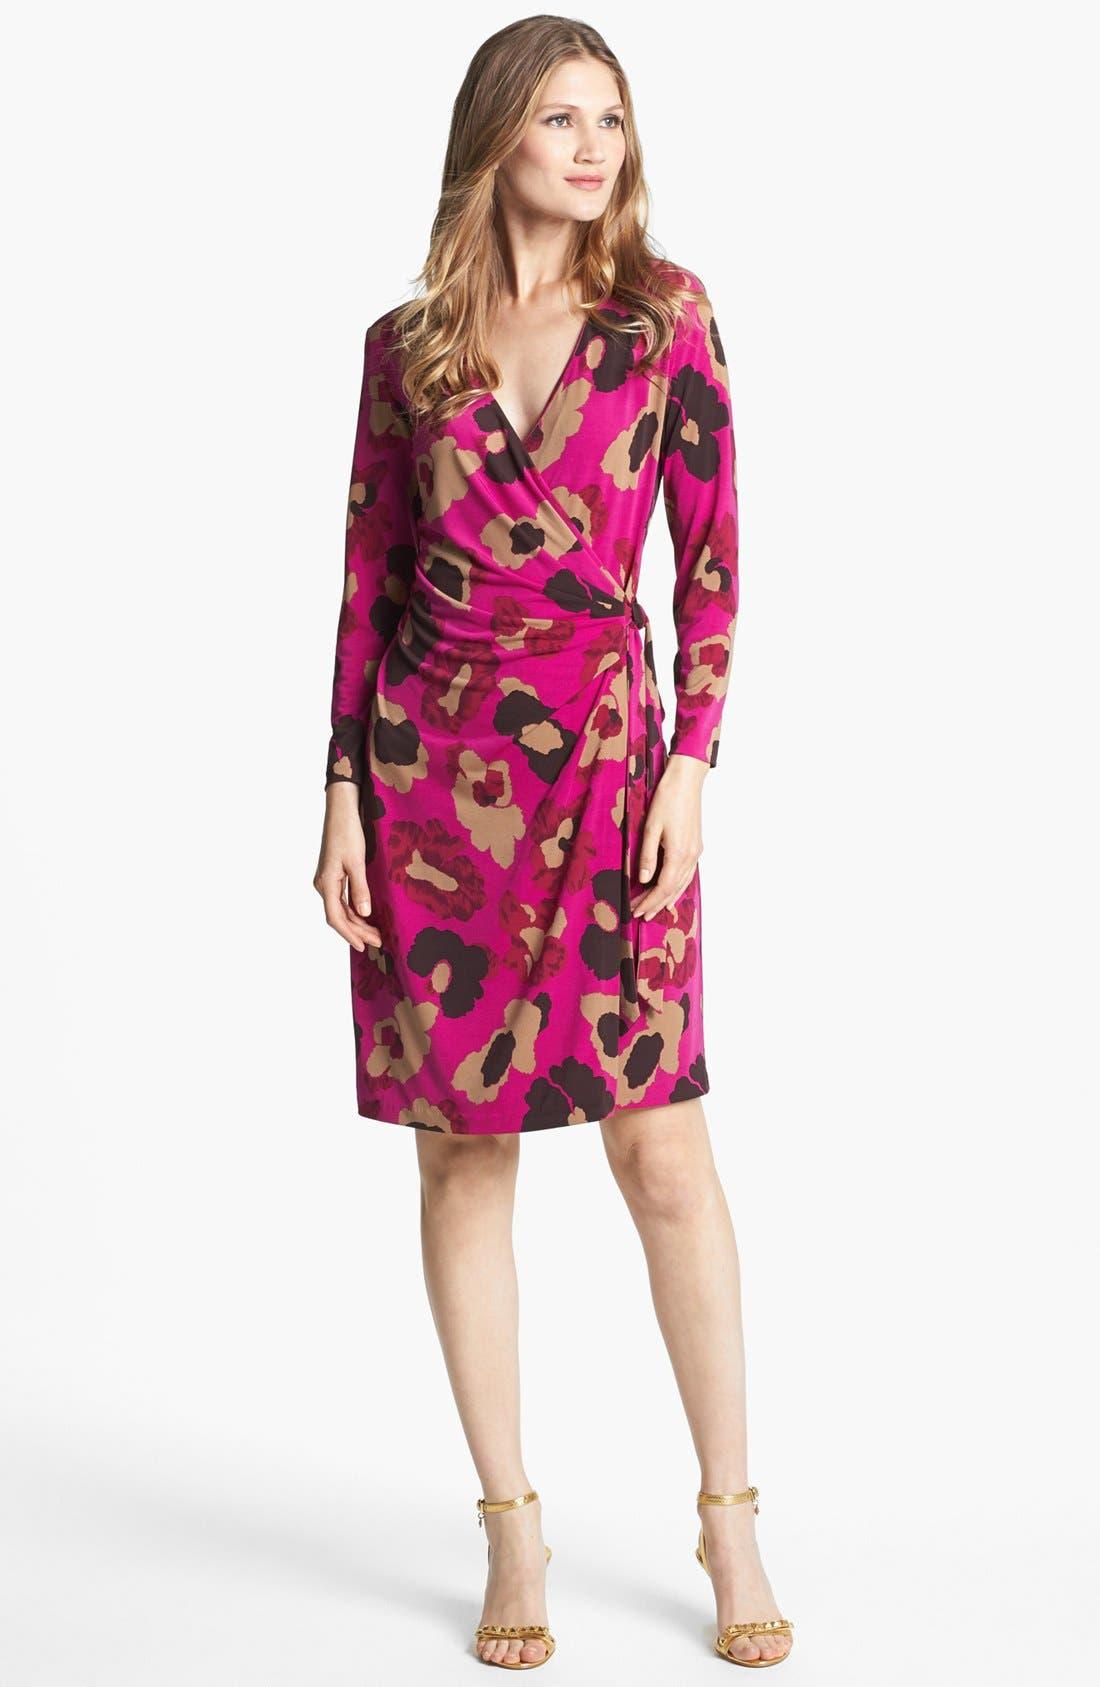 Alternate Image 1 Selected - Anne Klein Floral Print Faux Wrap Dress